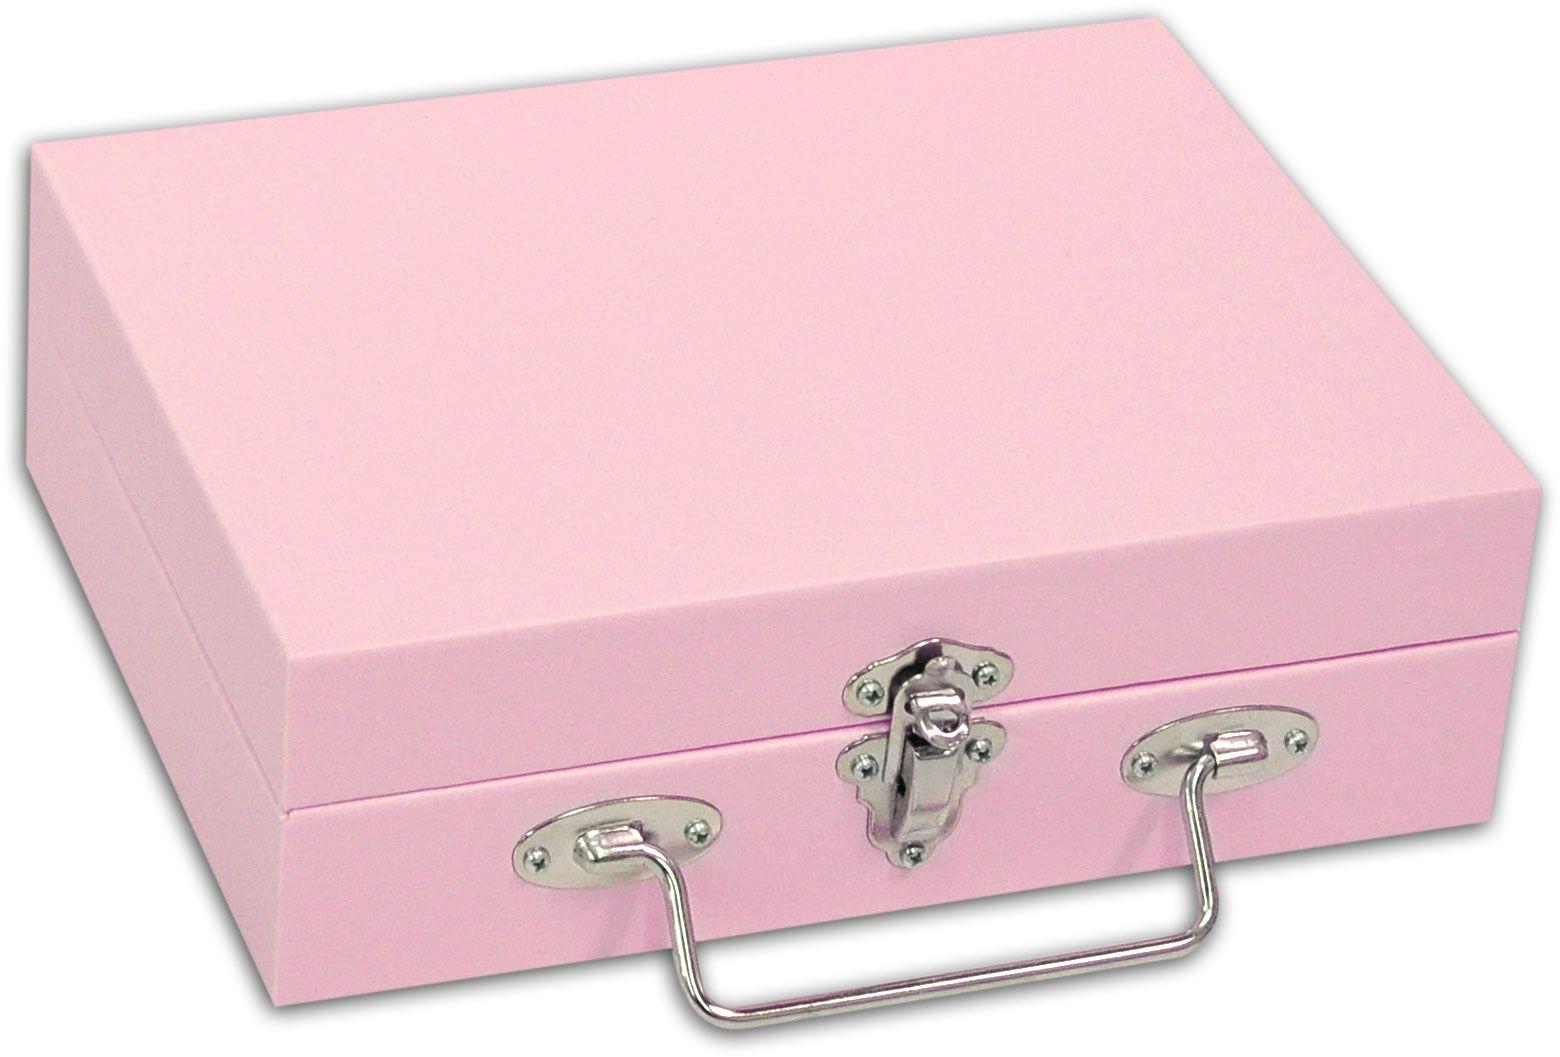 Maleta / Porta-Joias Pequeno - Rosa bebê / Cinza